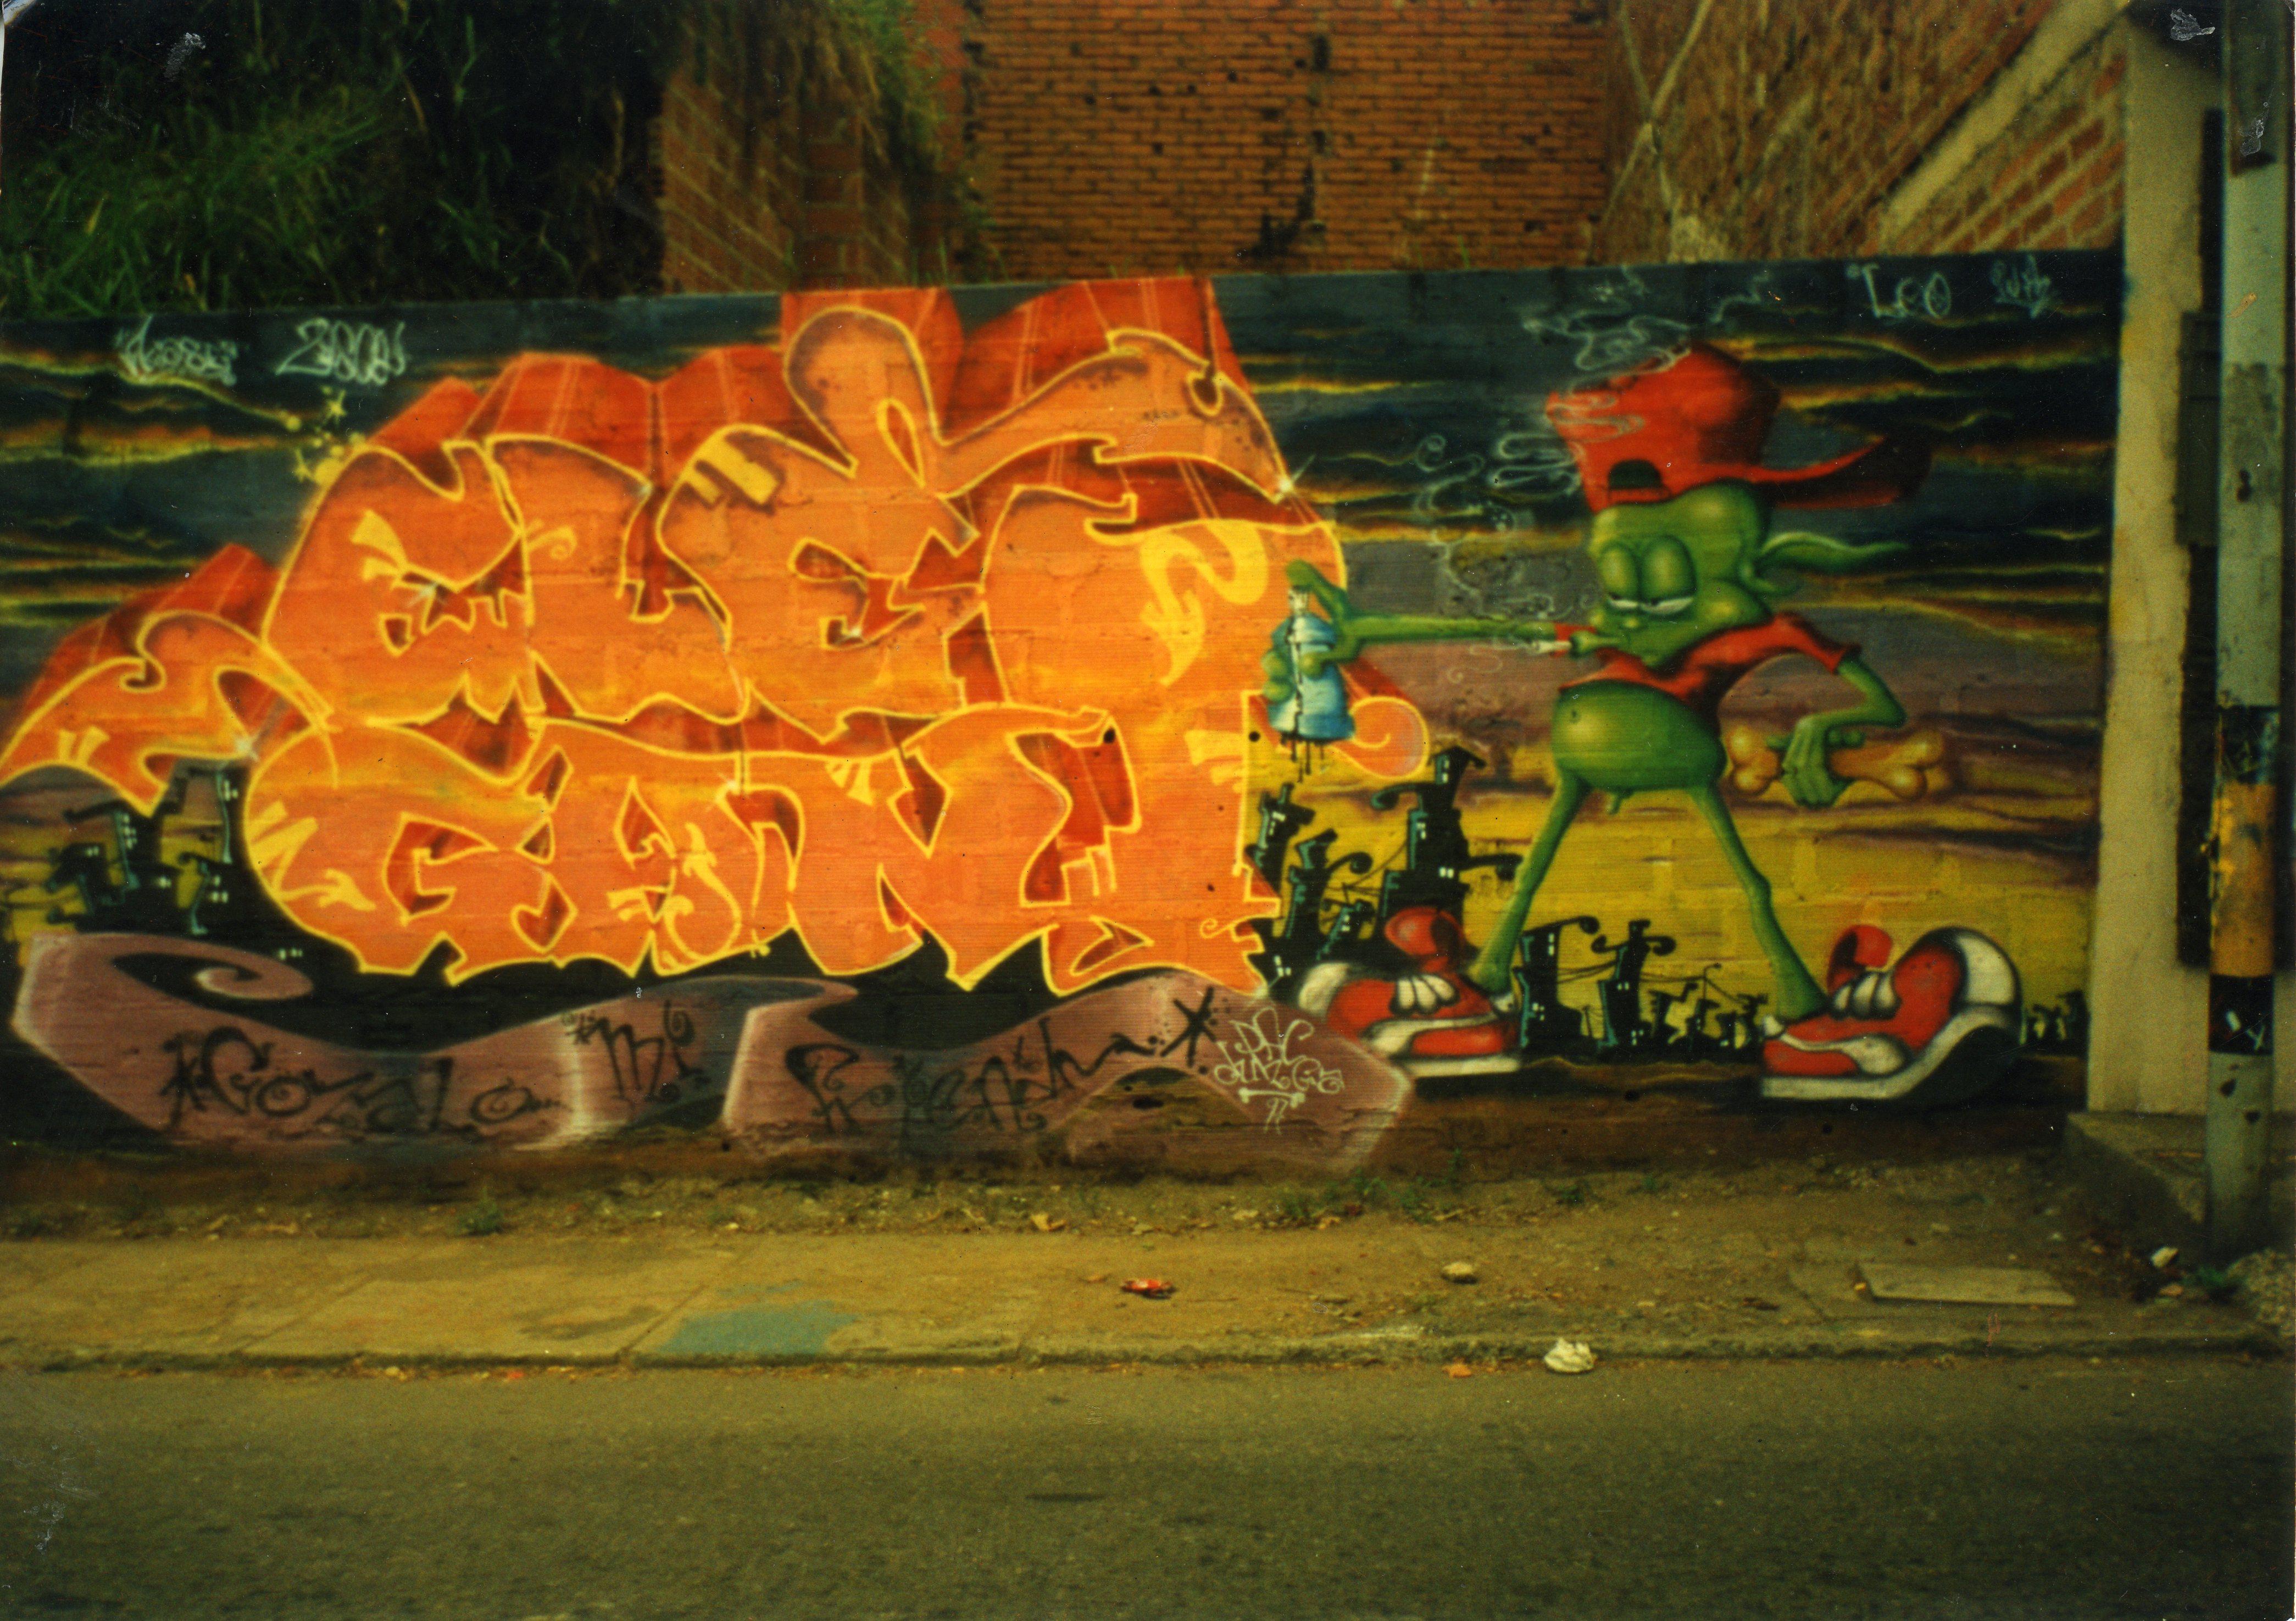 graffiti_elegant_por_pac_dunga_y_pick_1997_fotografia_archivo_personal_alejandro_villada_pac_dunga_.jpg